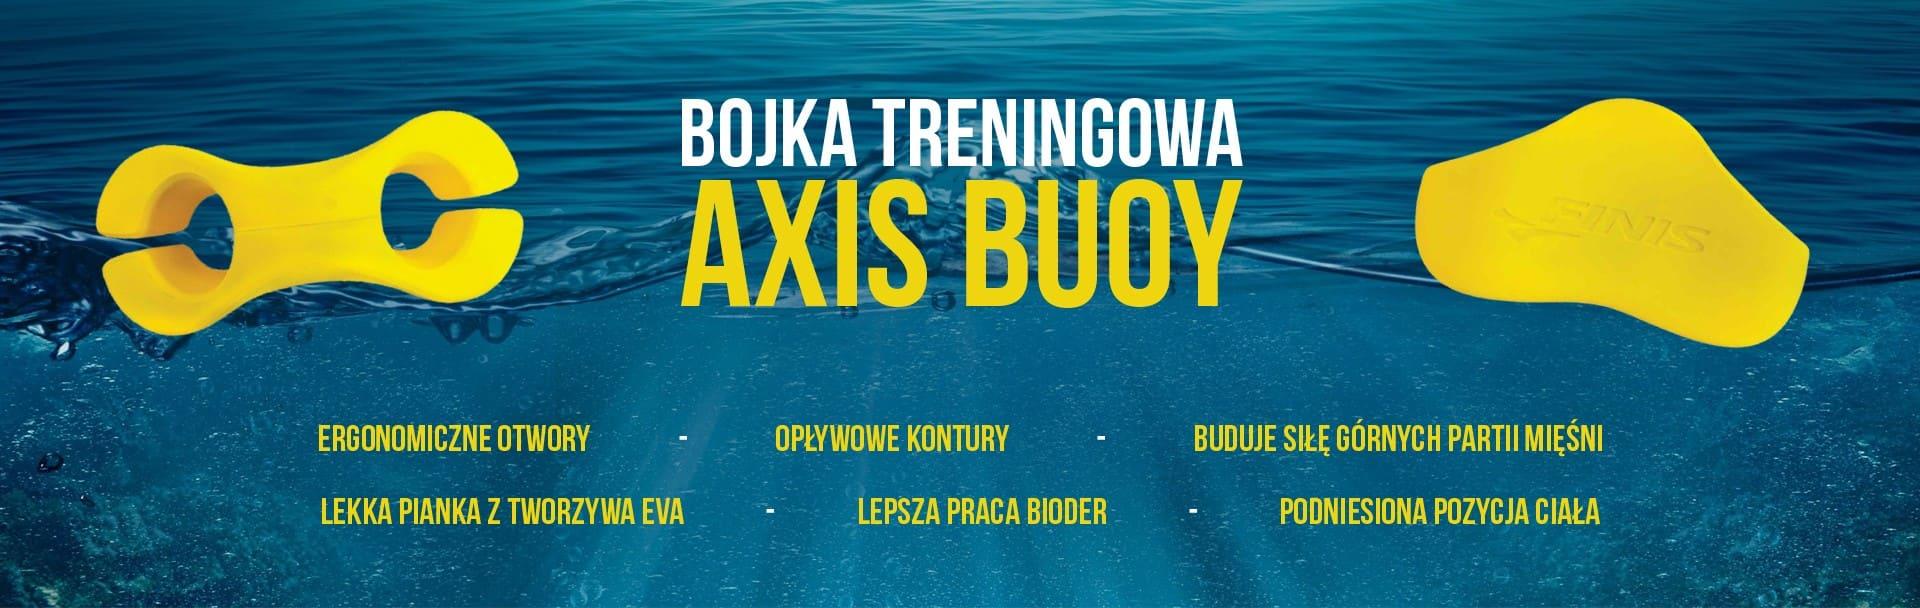 Axis BUOY